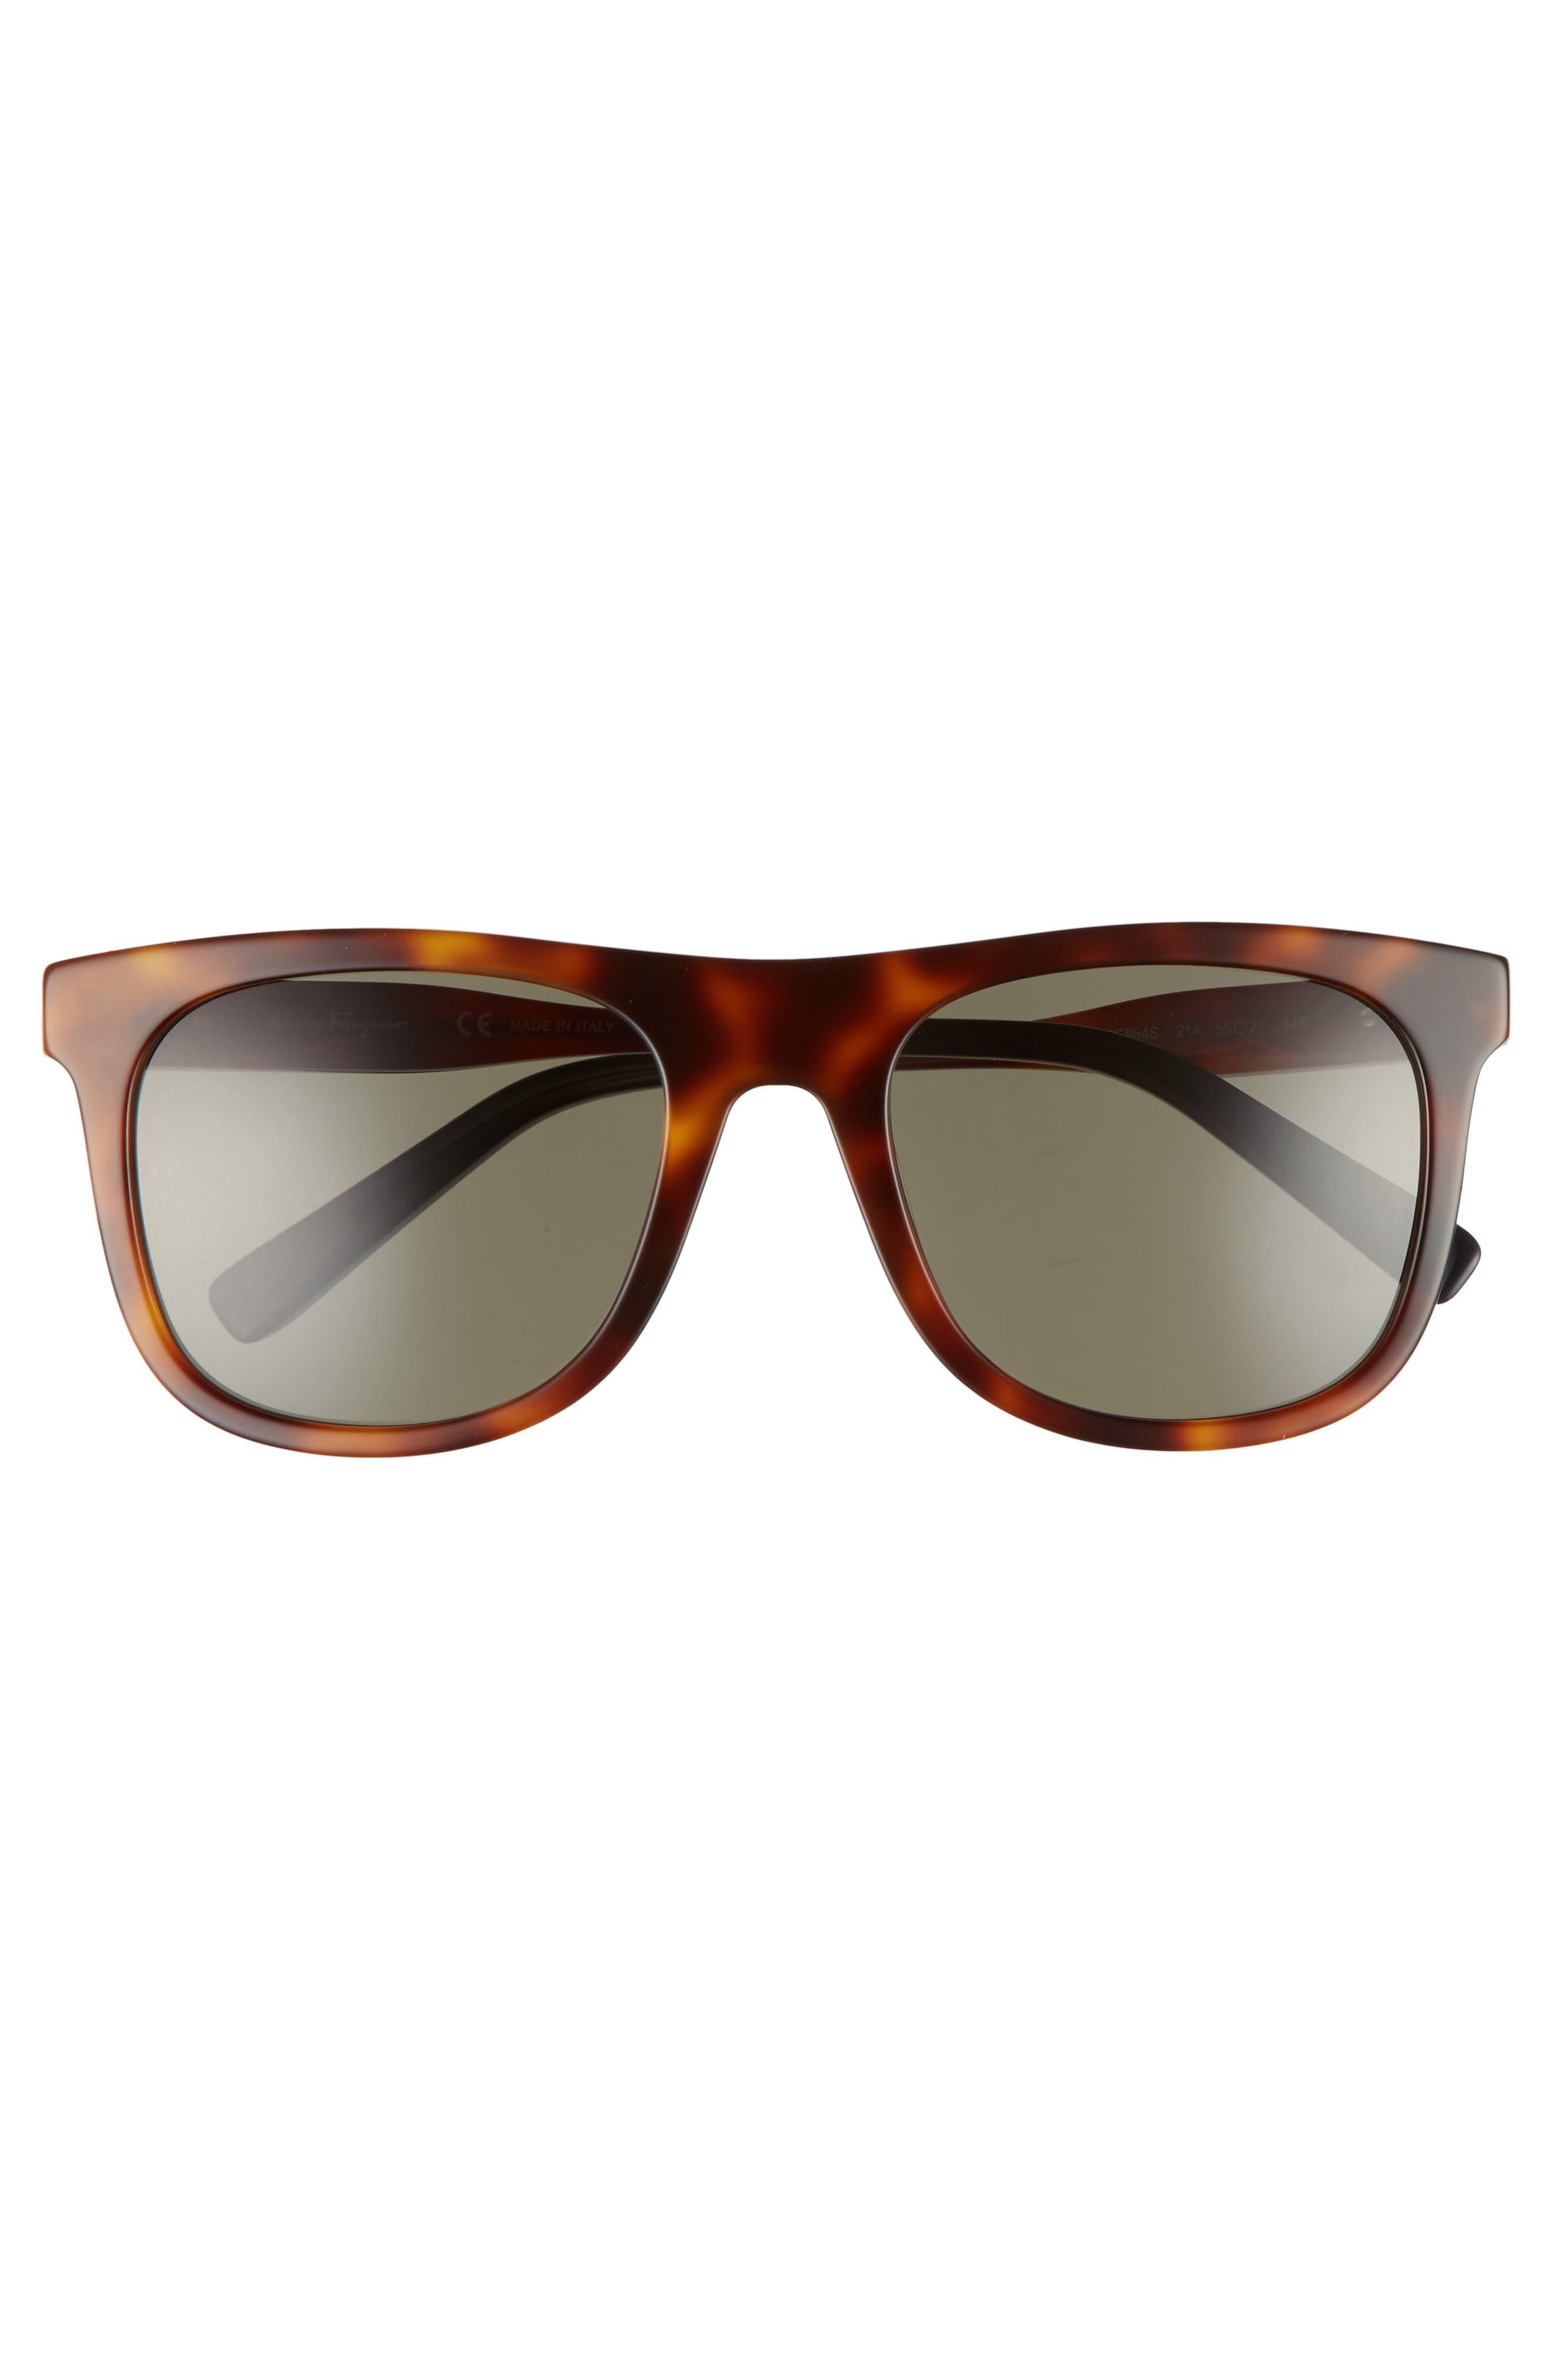 55mm Sunglasses,                             Alternate thumbnail 2, color,                             Tortoise